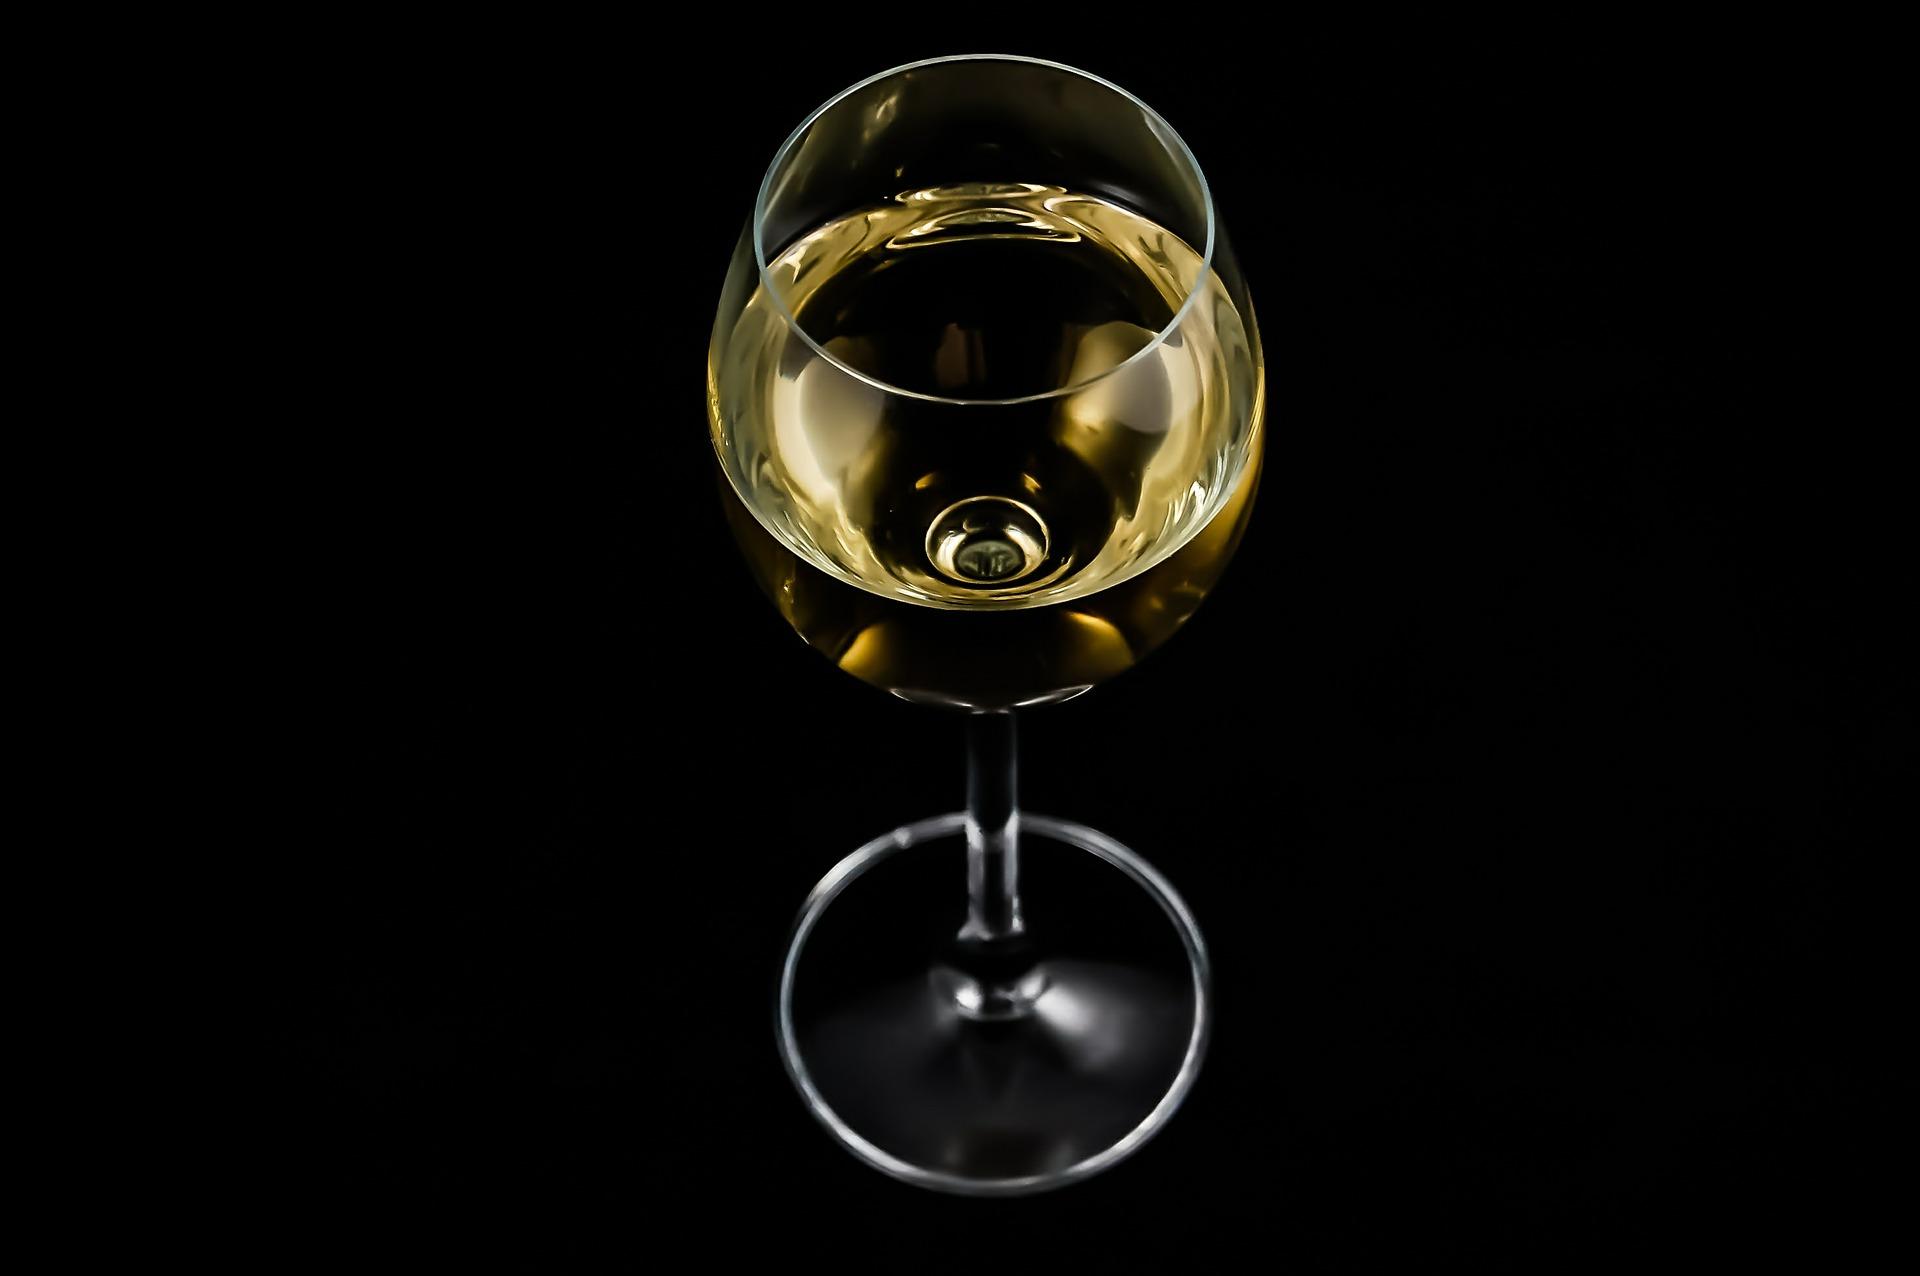 wine, alcohol, pregnancy, health